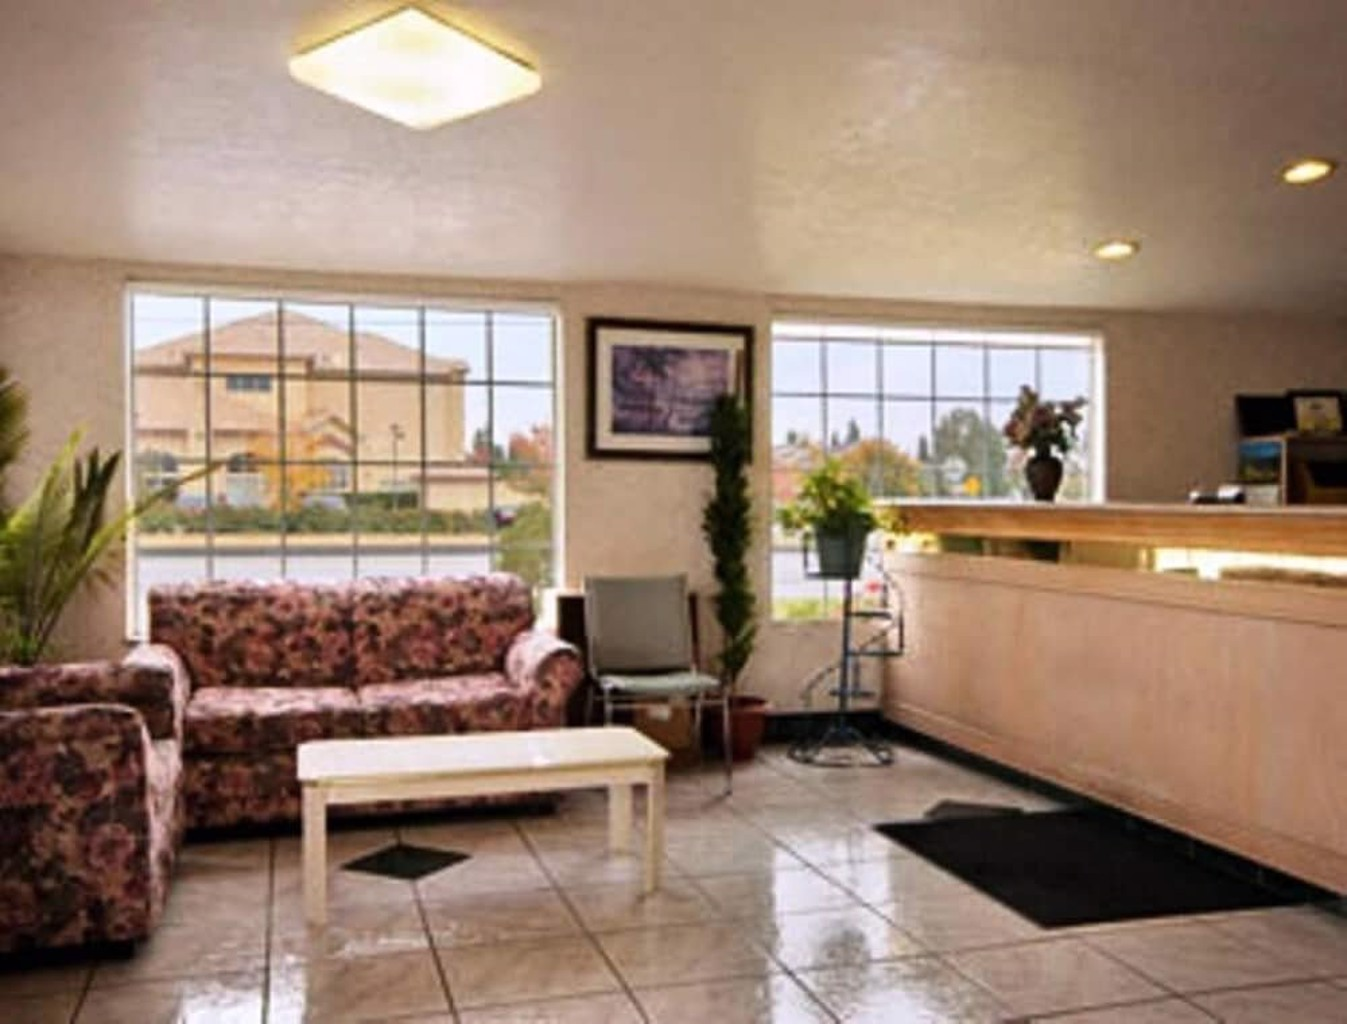 Gallery image of Gateway Inn